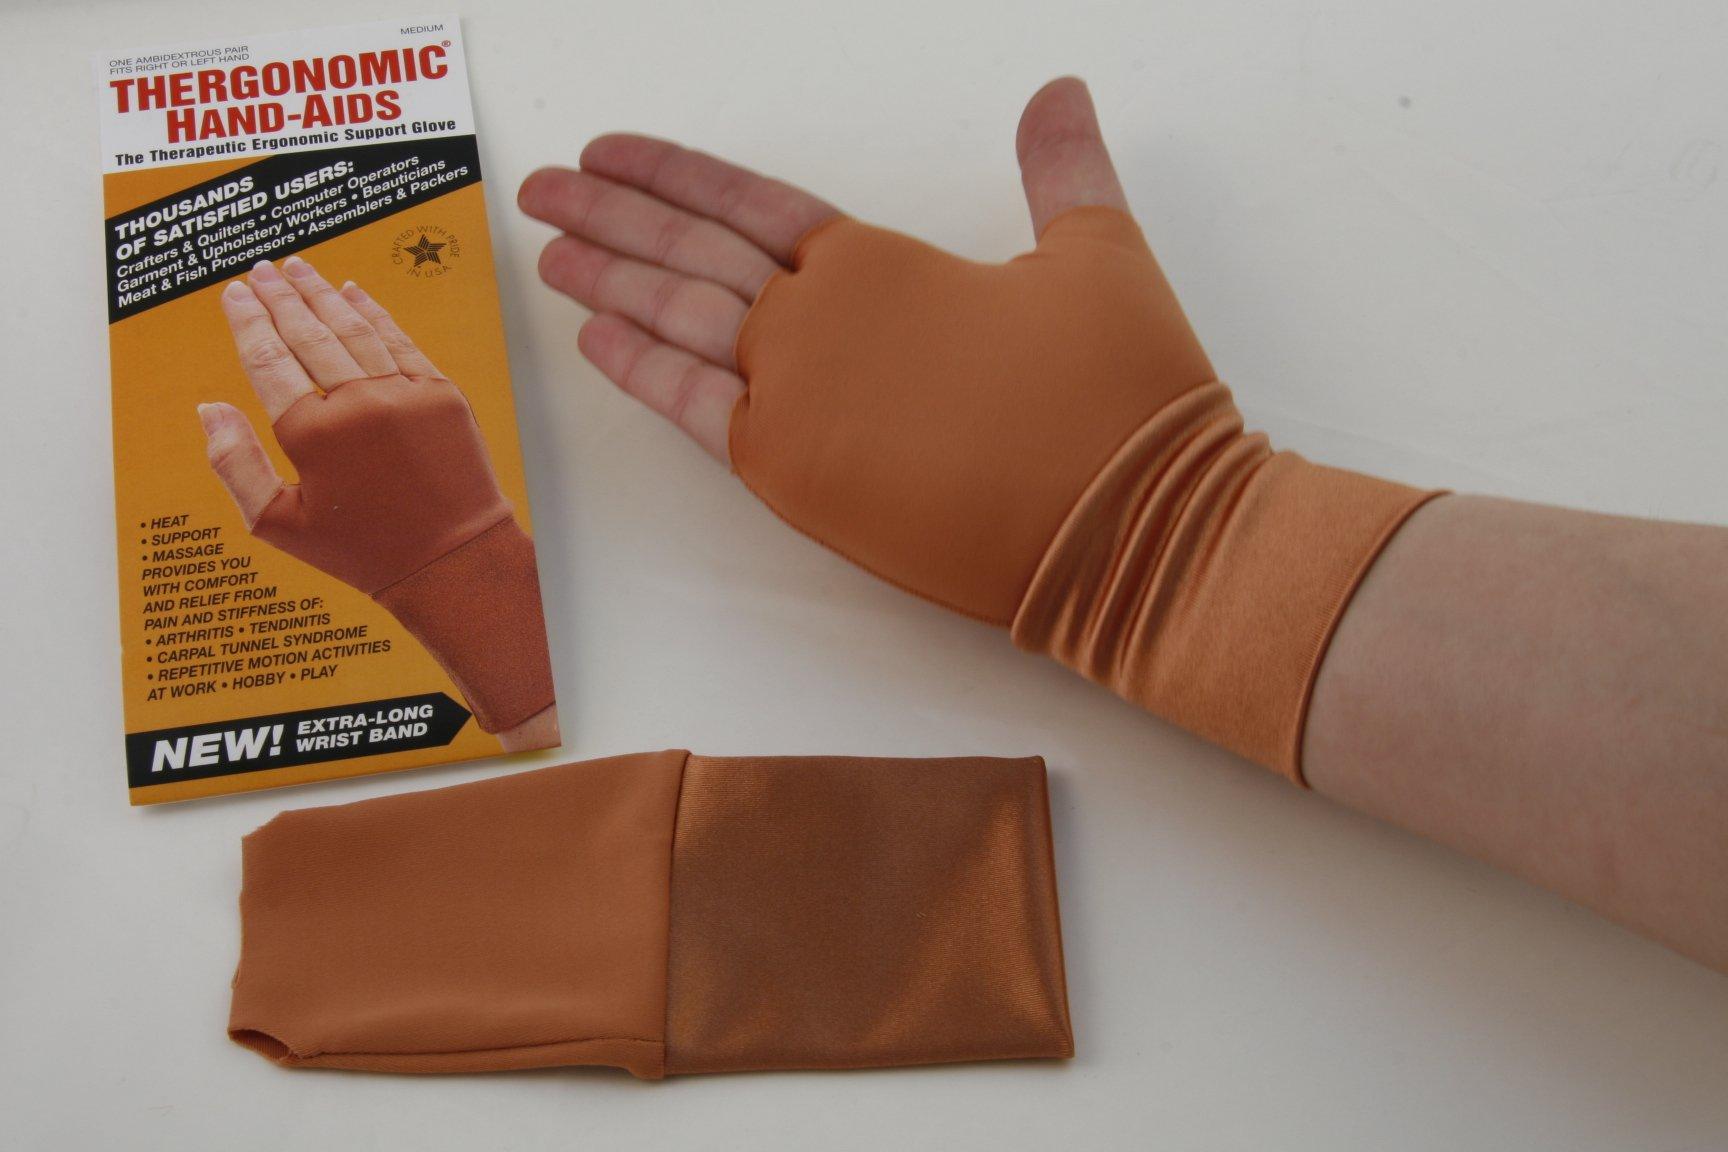 Thergonomic Hand Aids Gloves